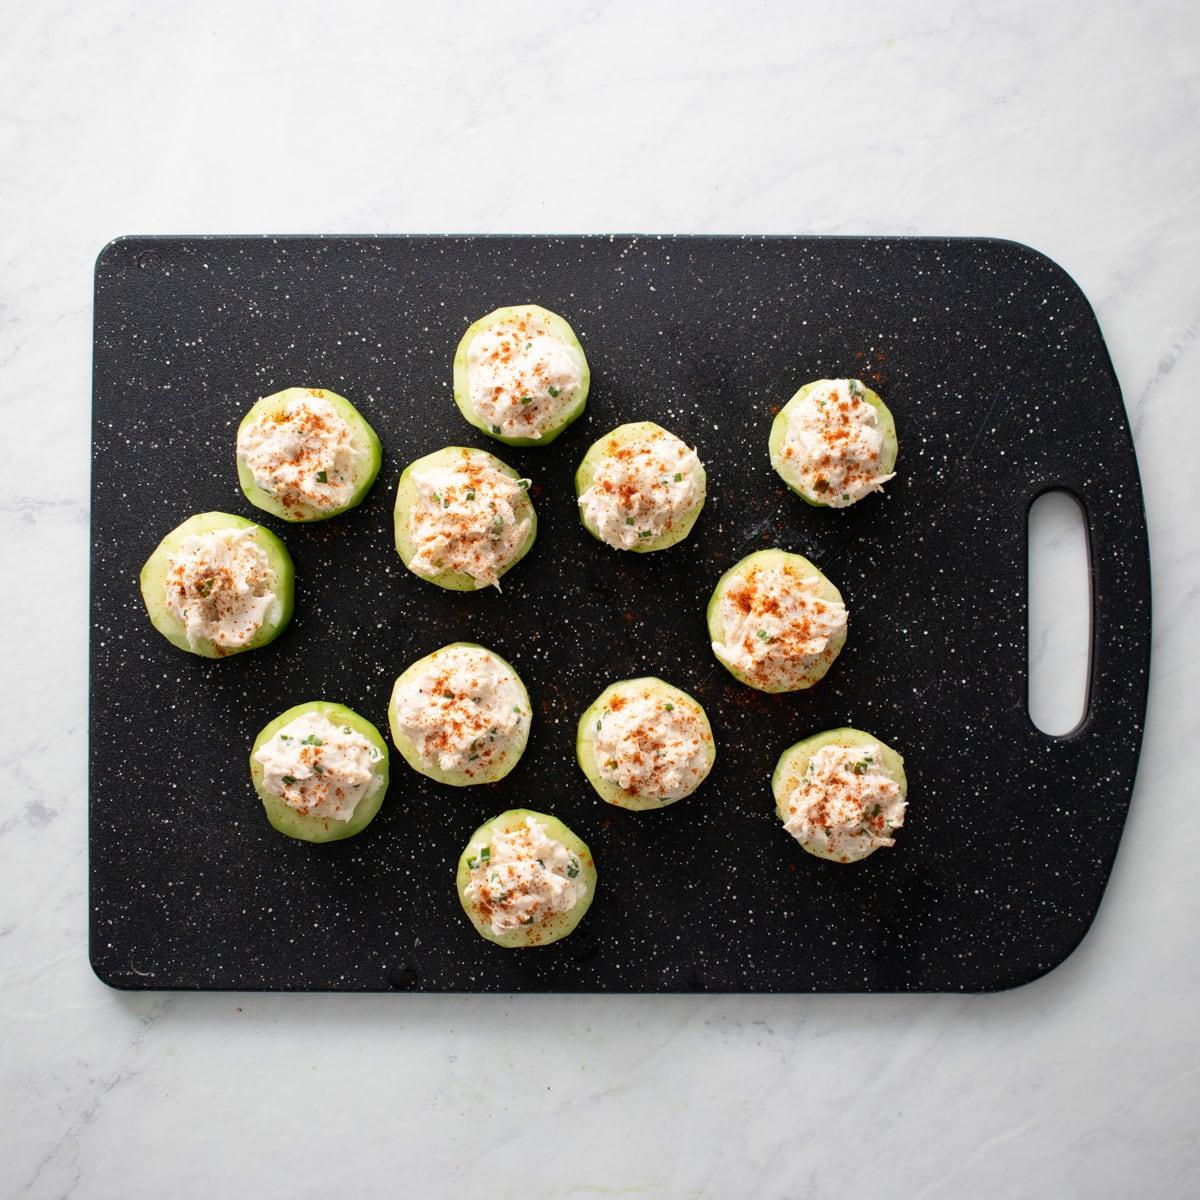 12 cucumber crab bites sprinkled with paprika